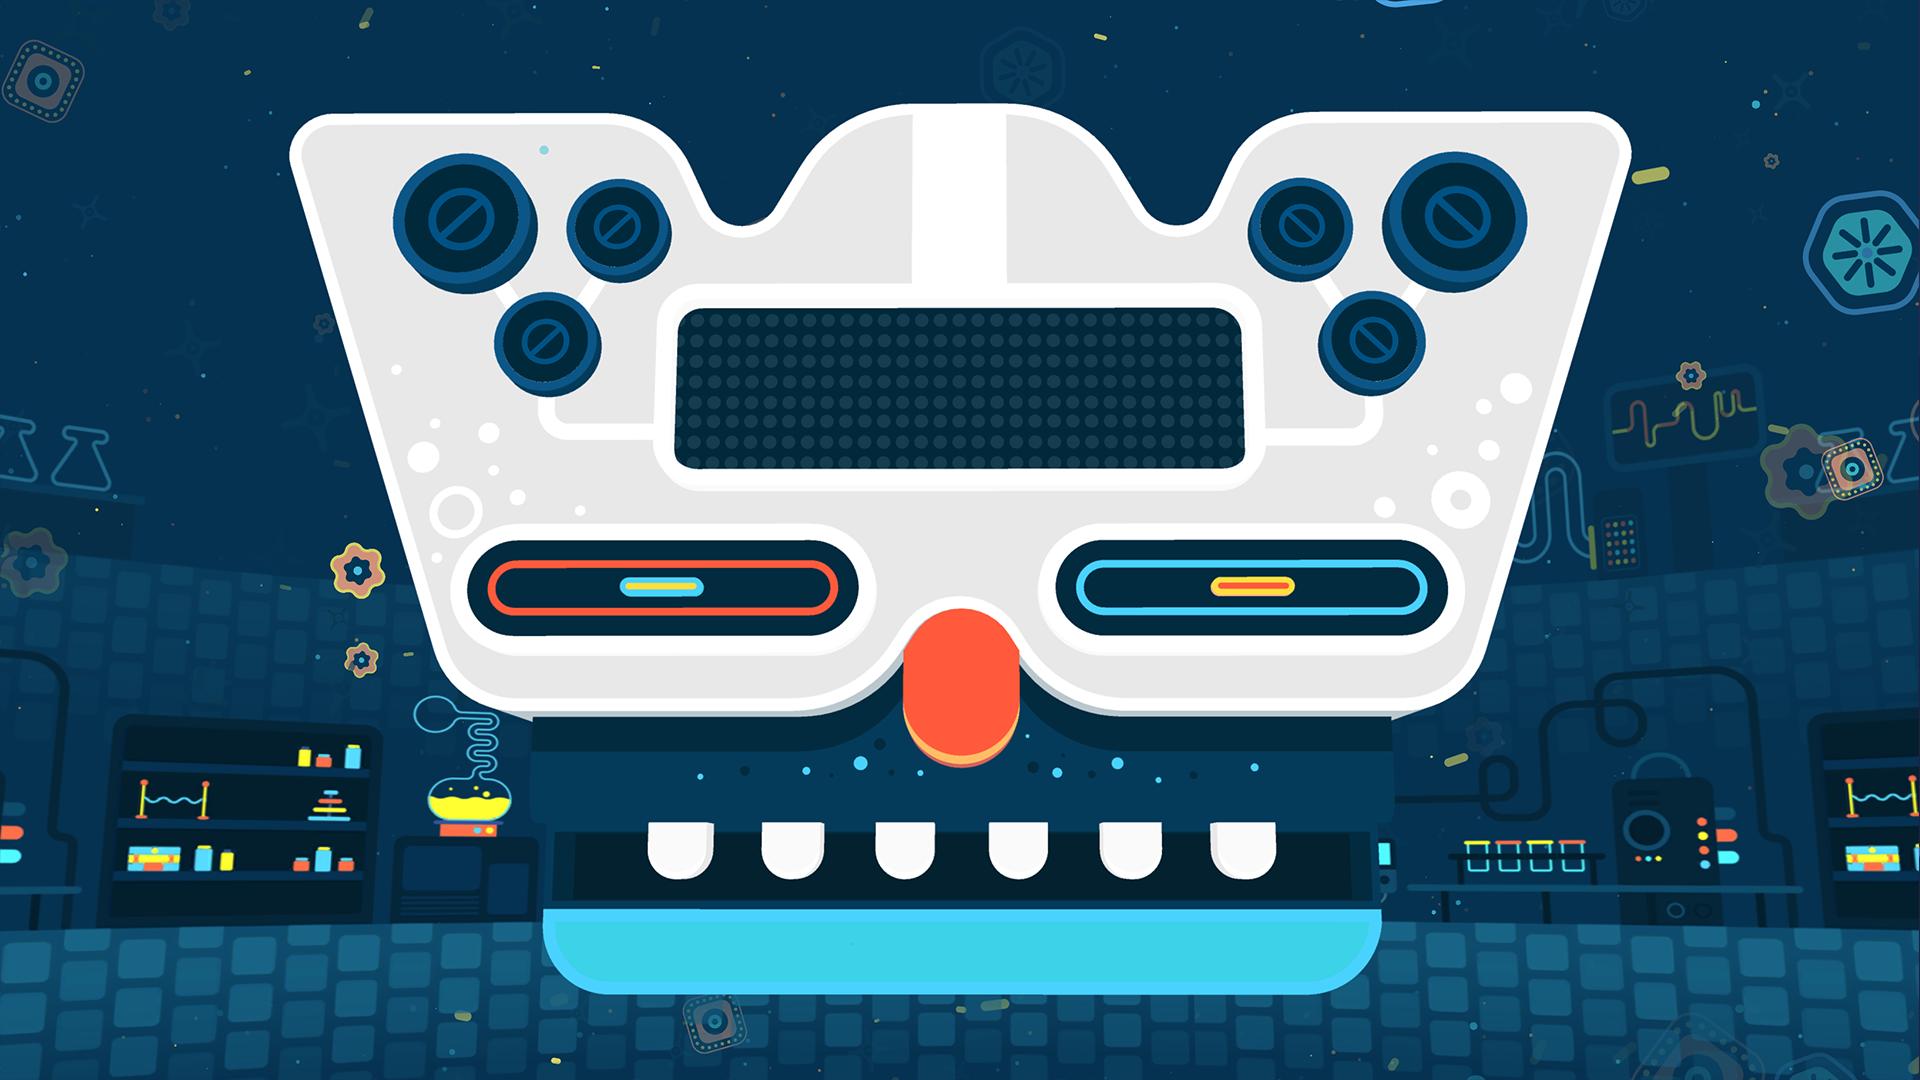 『GNOG (ノッグ)』ゲーム画面